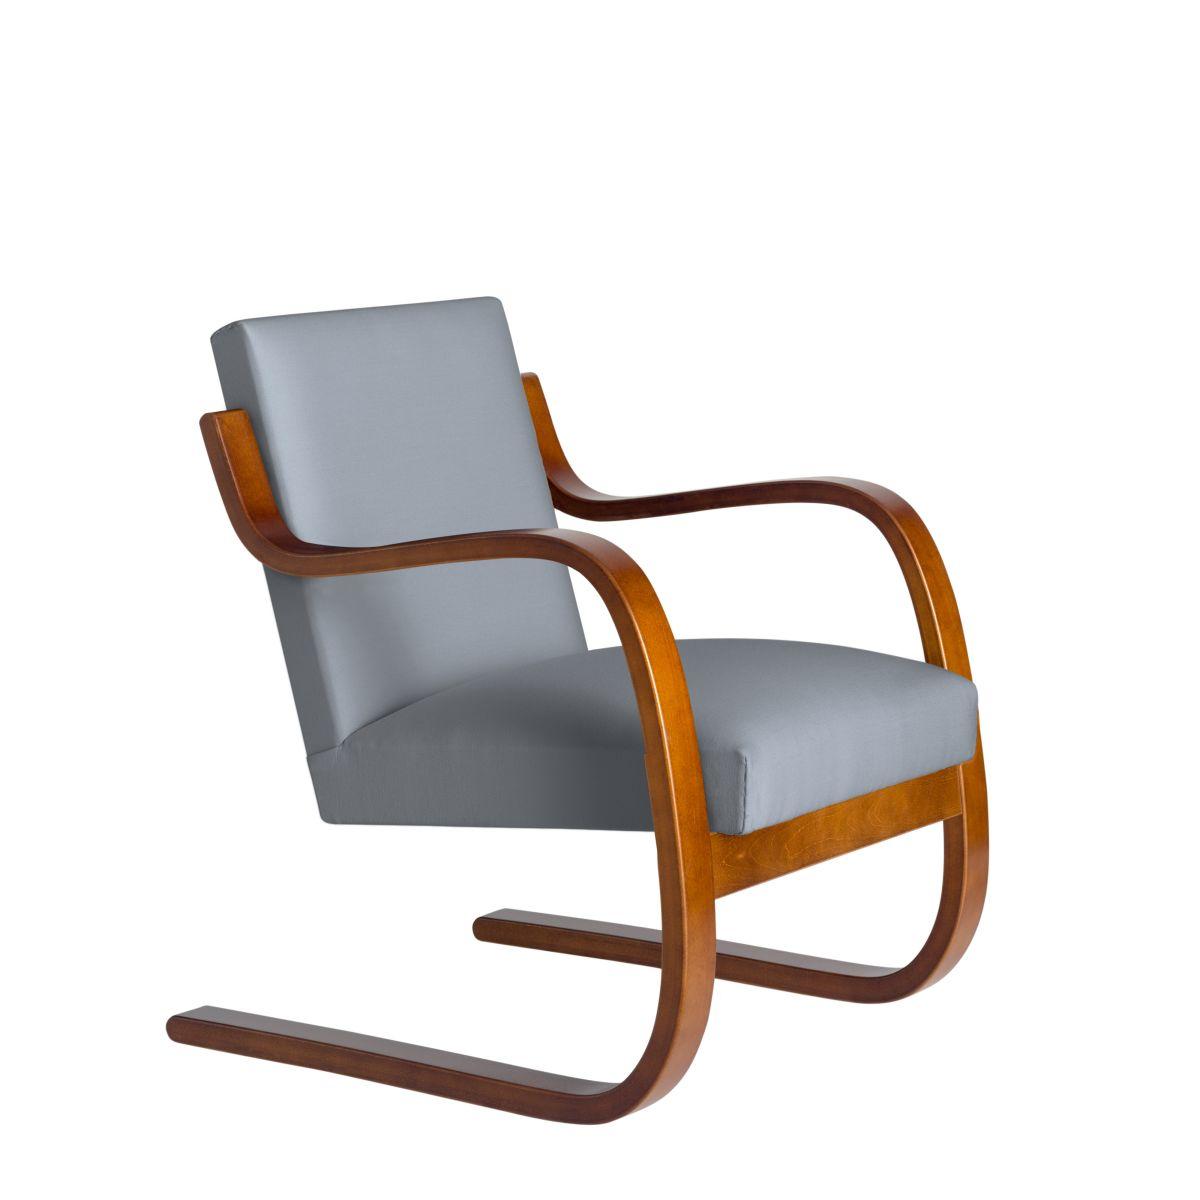 Armchair 402 Birchwalnut Stain Seat Fabric Upholstery Artek Grey 2494509